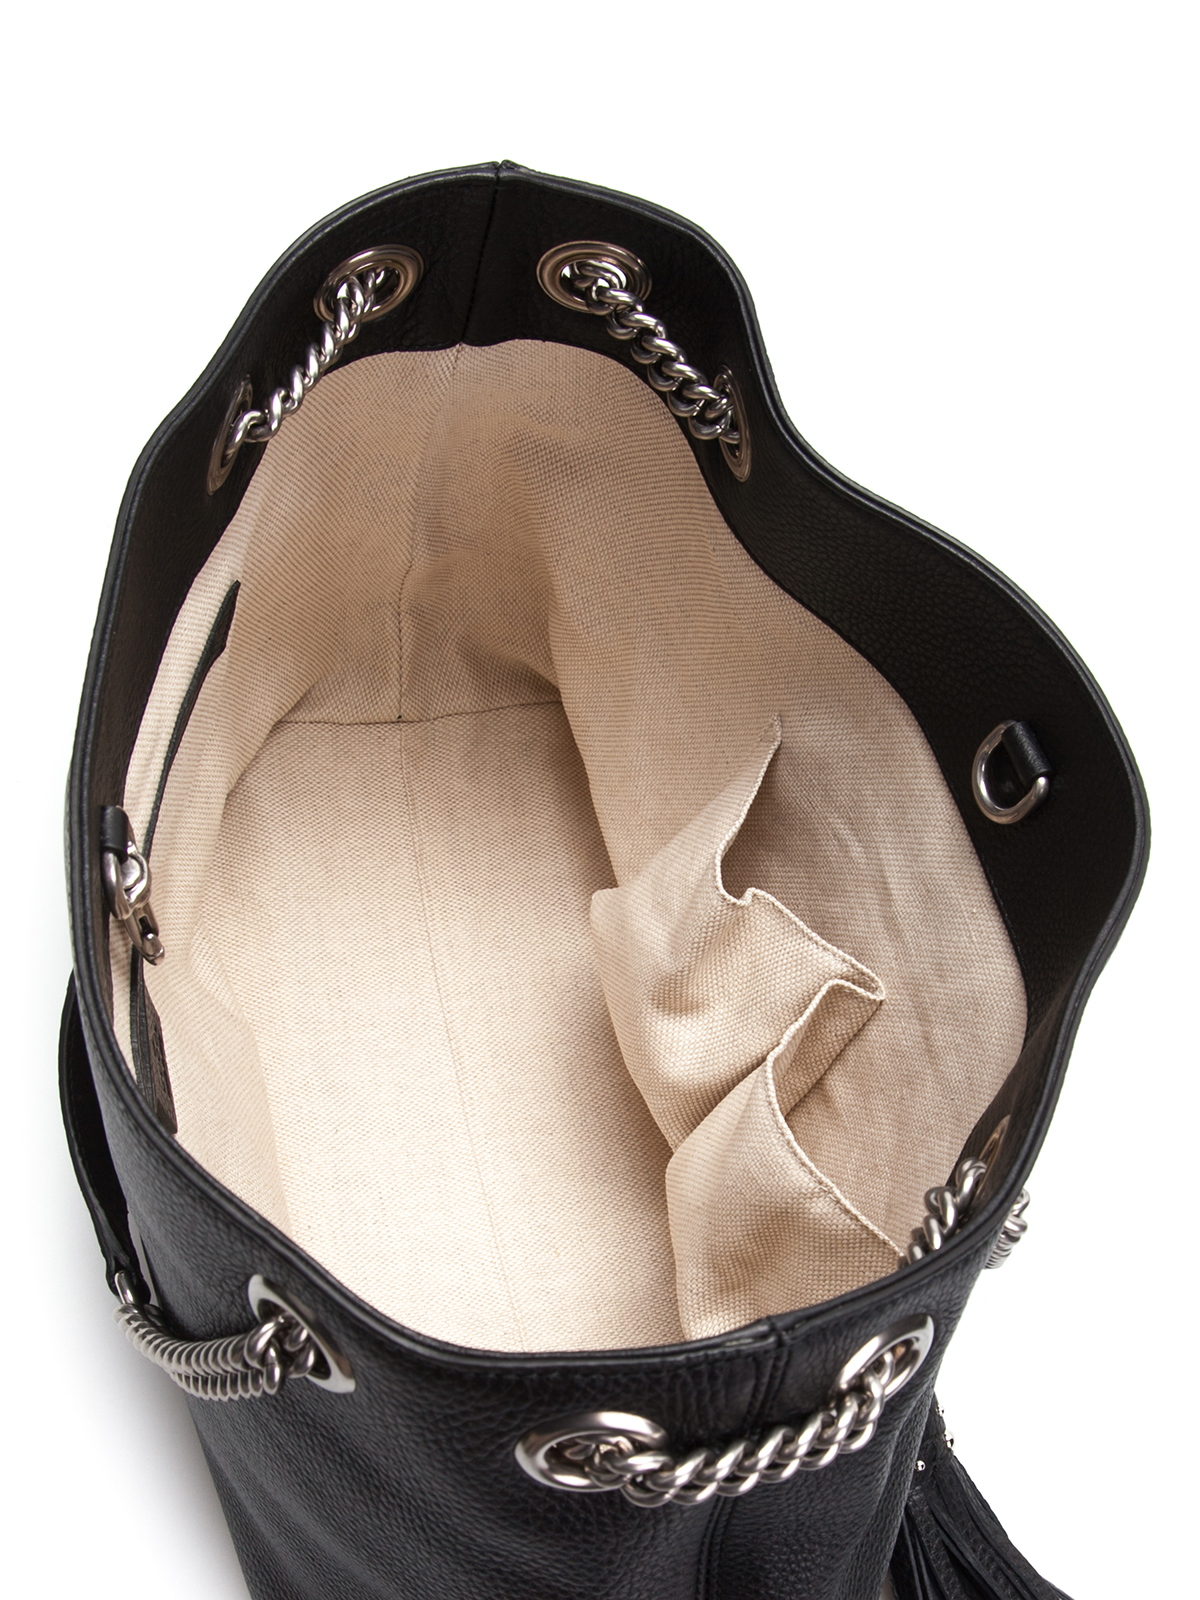 59721effd961 iKRIX GUCCI  Soho studded leather shoulder bag · GUCCI  totes bags ...